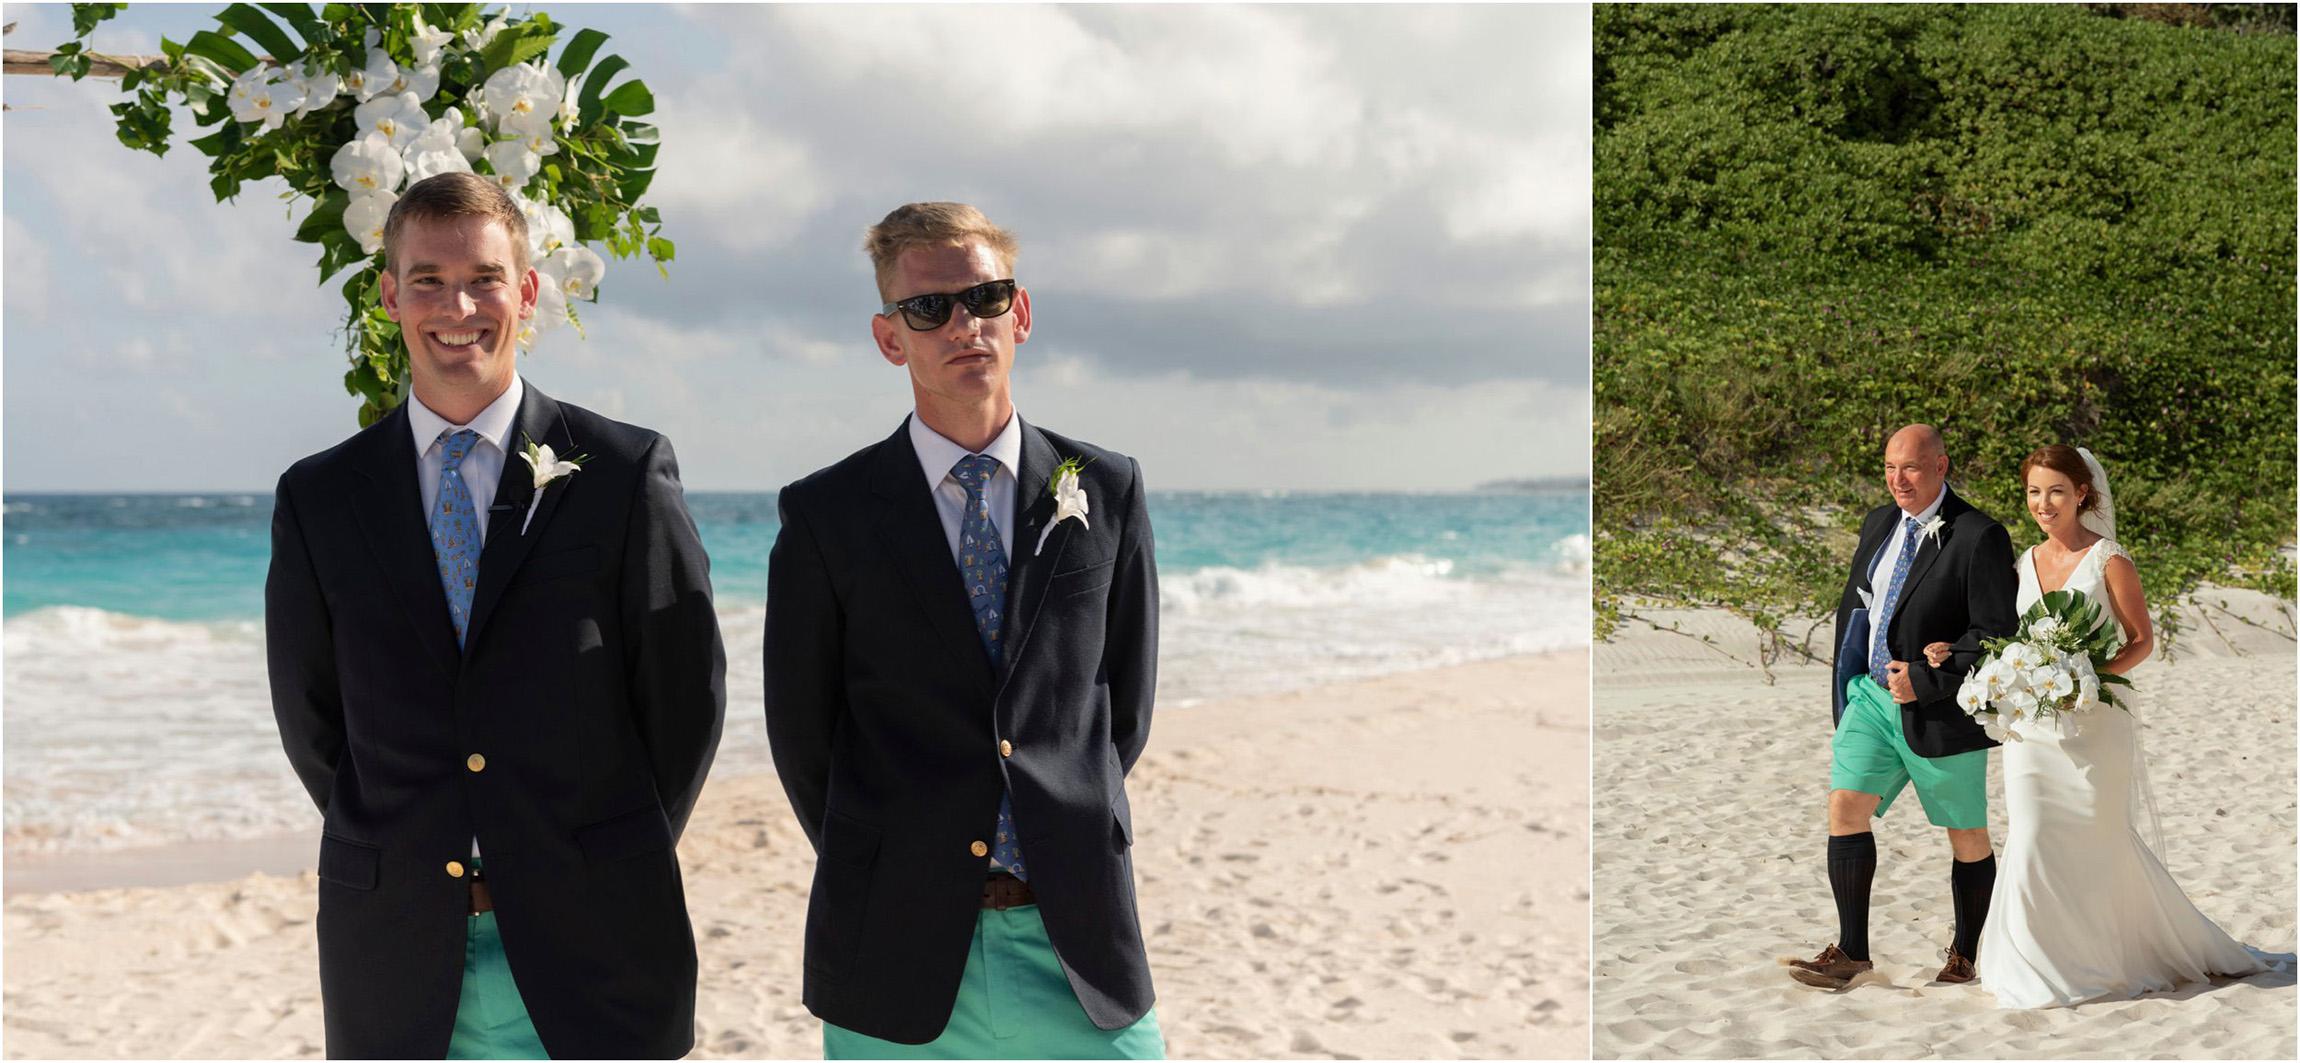 ©FianderFoto_Bermuda Wedding Photographer_Mid Ocean_Rachel_Angus_022.jpg